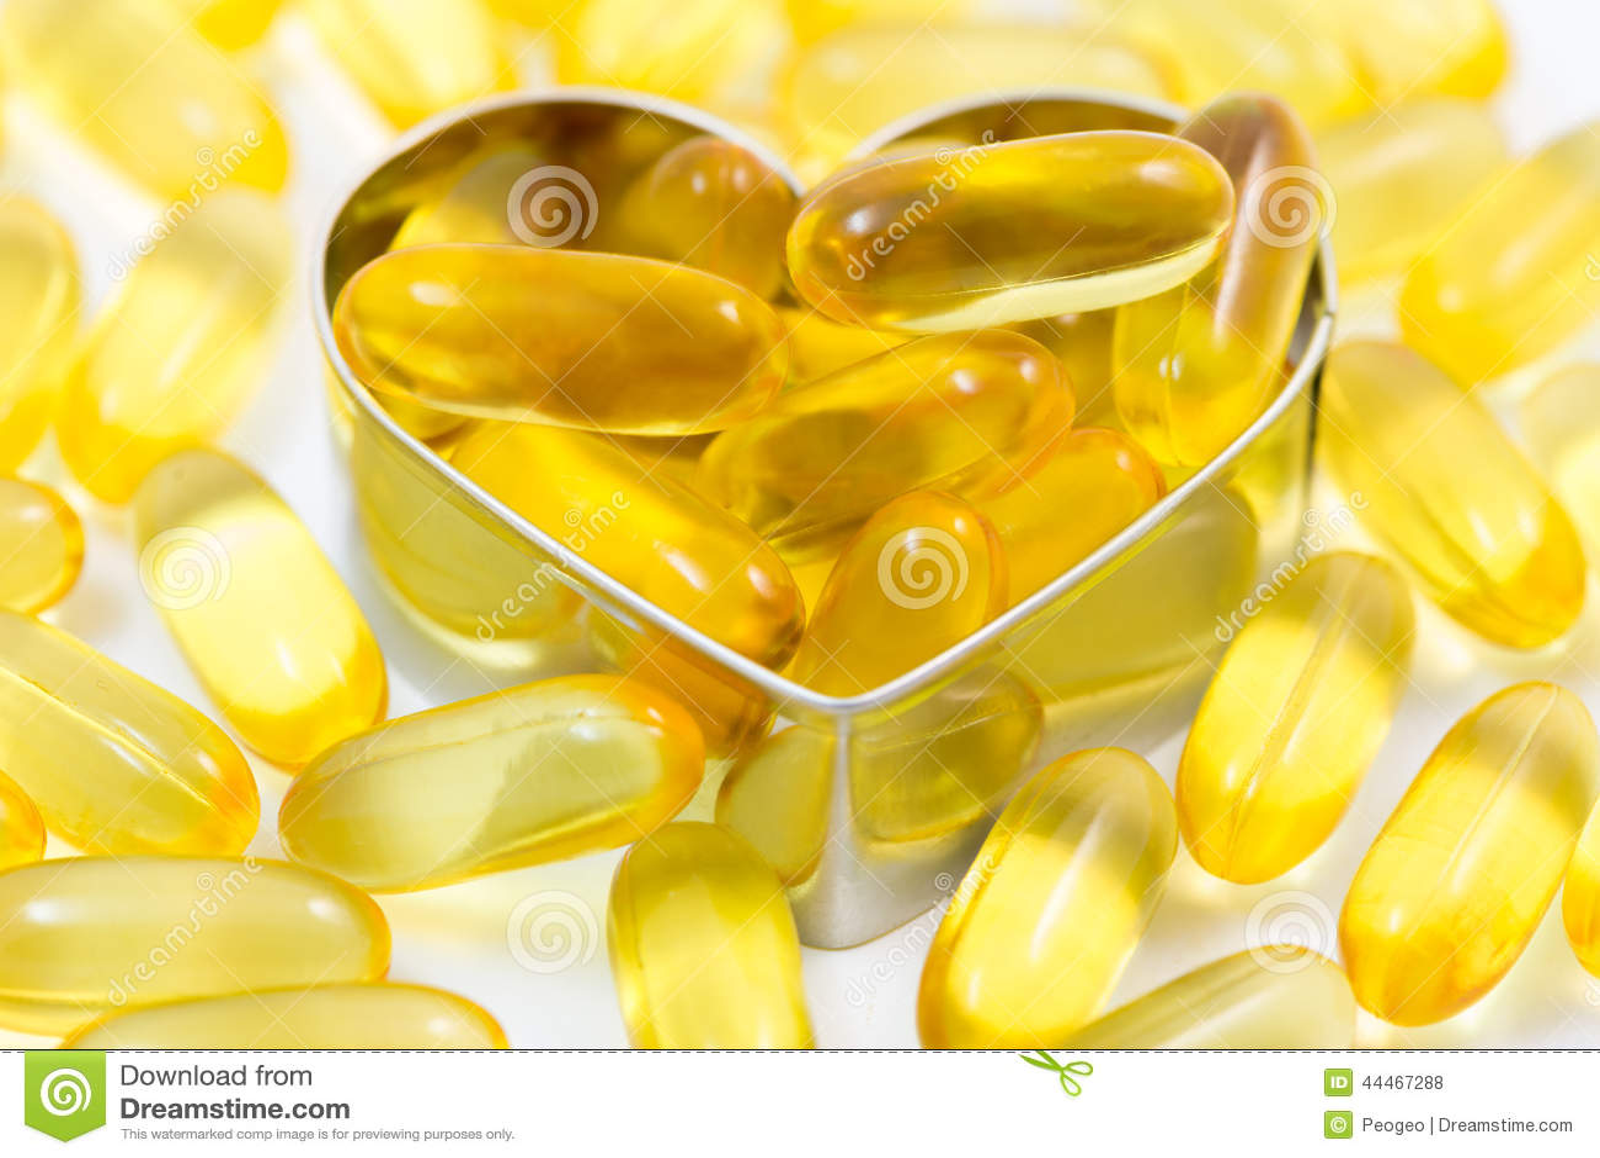 Fish oil pills on heart shape box